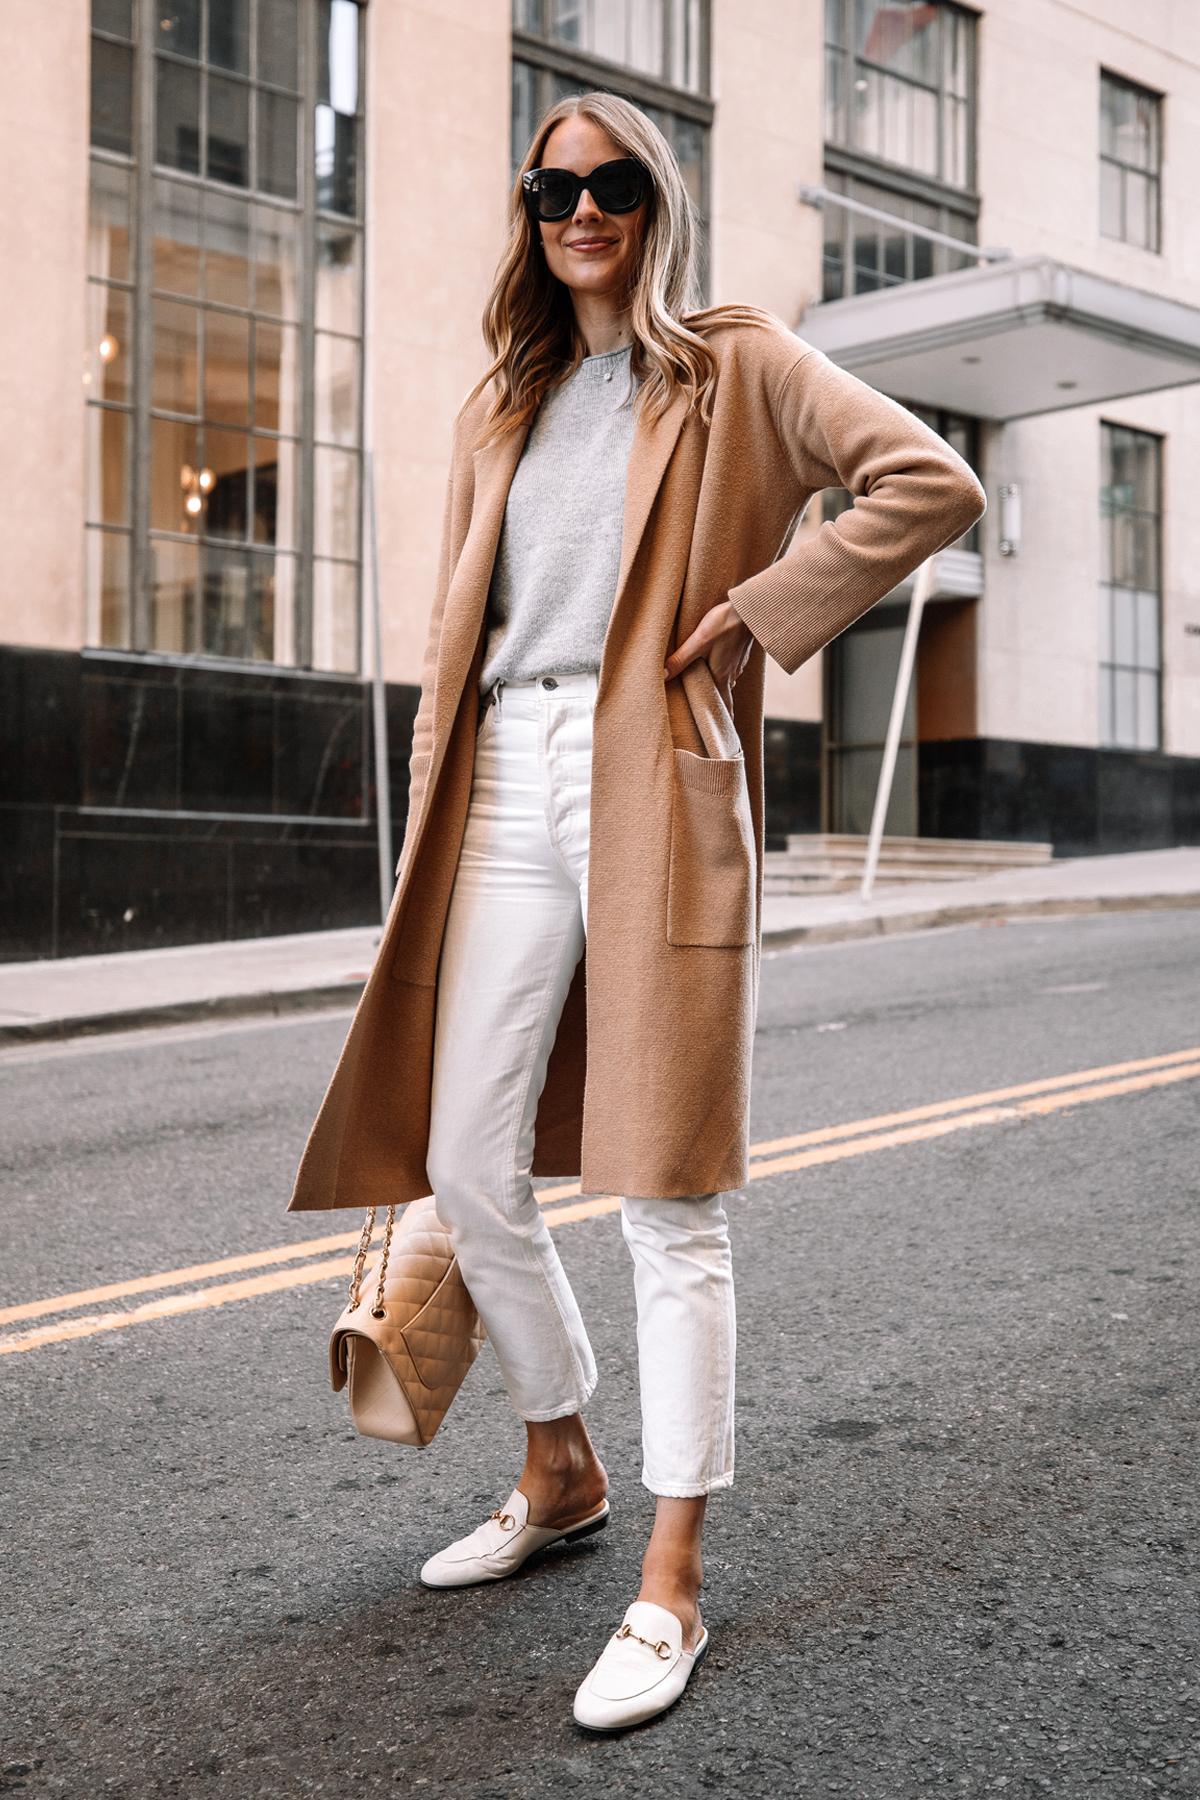 Fashion Jackson Wearing Tan Cardigan Grey Sweater White Jeans White Gucci Princetown Mules Street Style 2